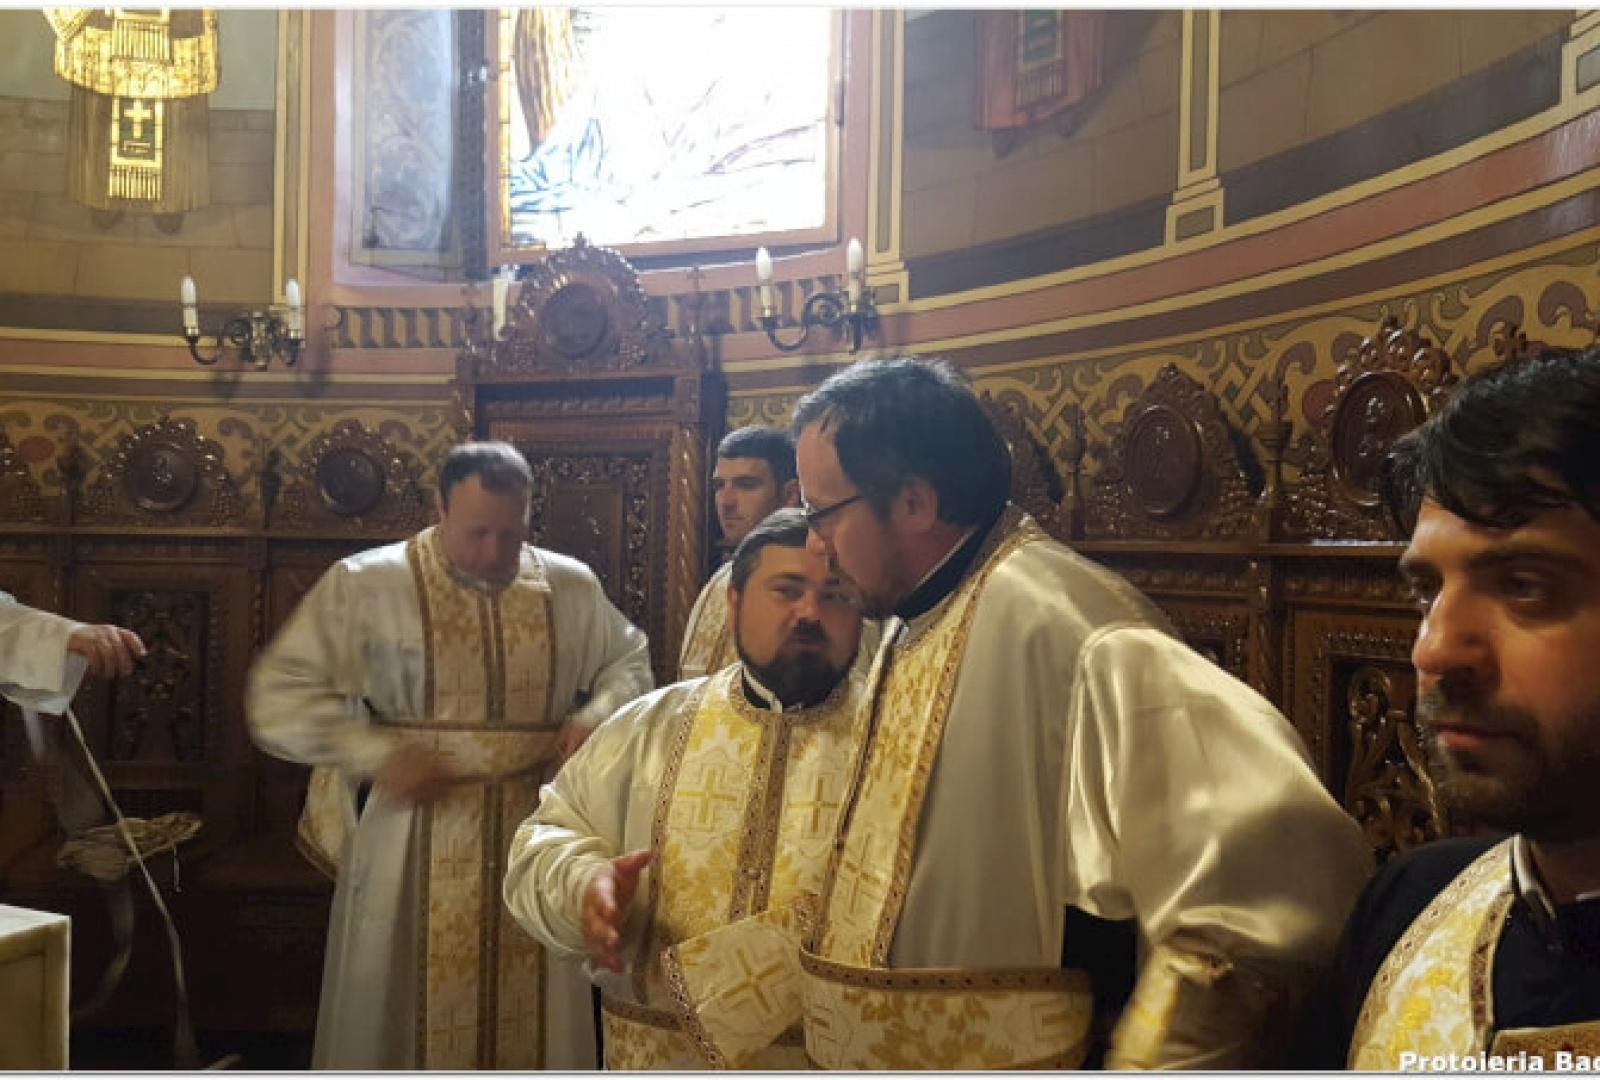 Catedrala Sf. Nicolae Bacău – iunie 2016 20160623_083001